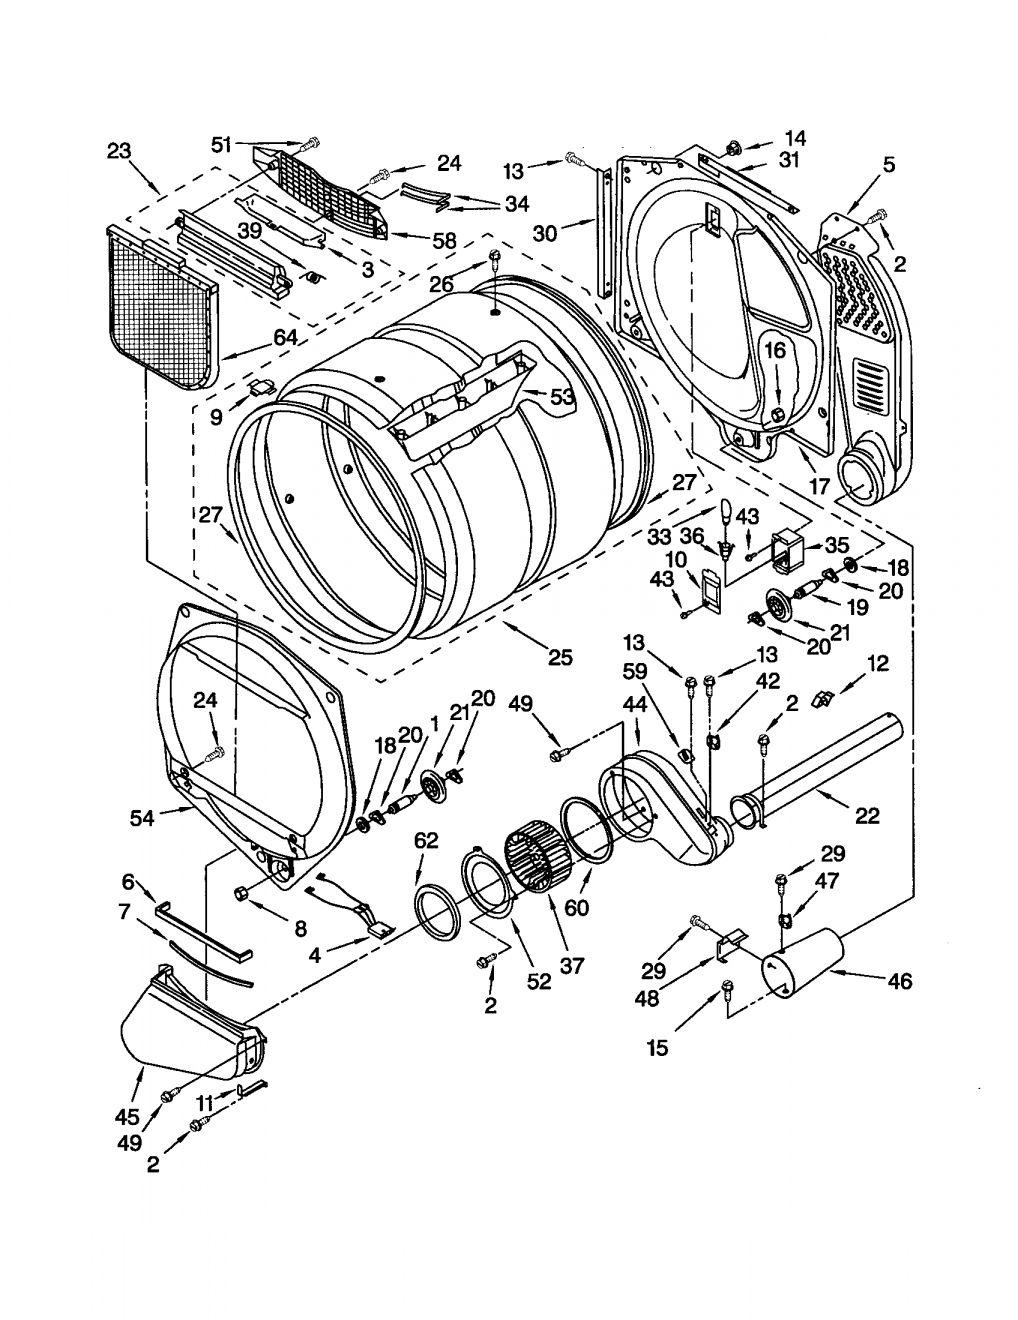 12 Kenmore Elite Electric Dryer Wiring Diagram Electric Dryers Gas Dryer Electrical Circuit Diagram